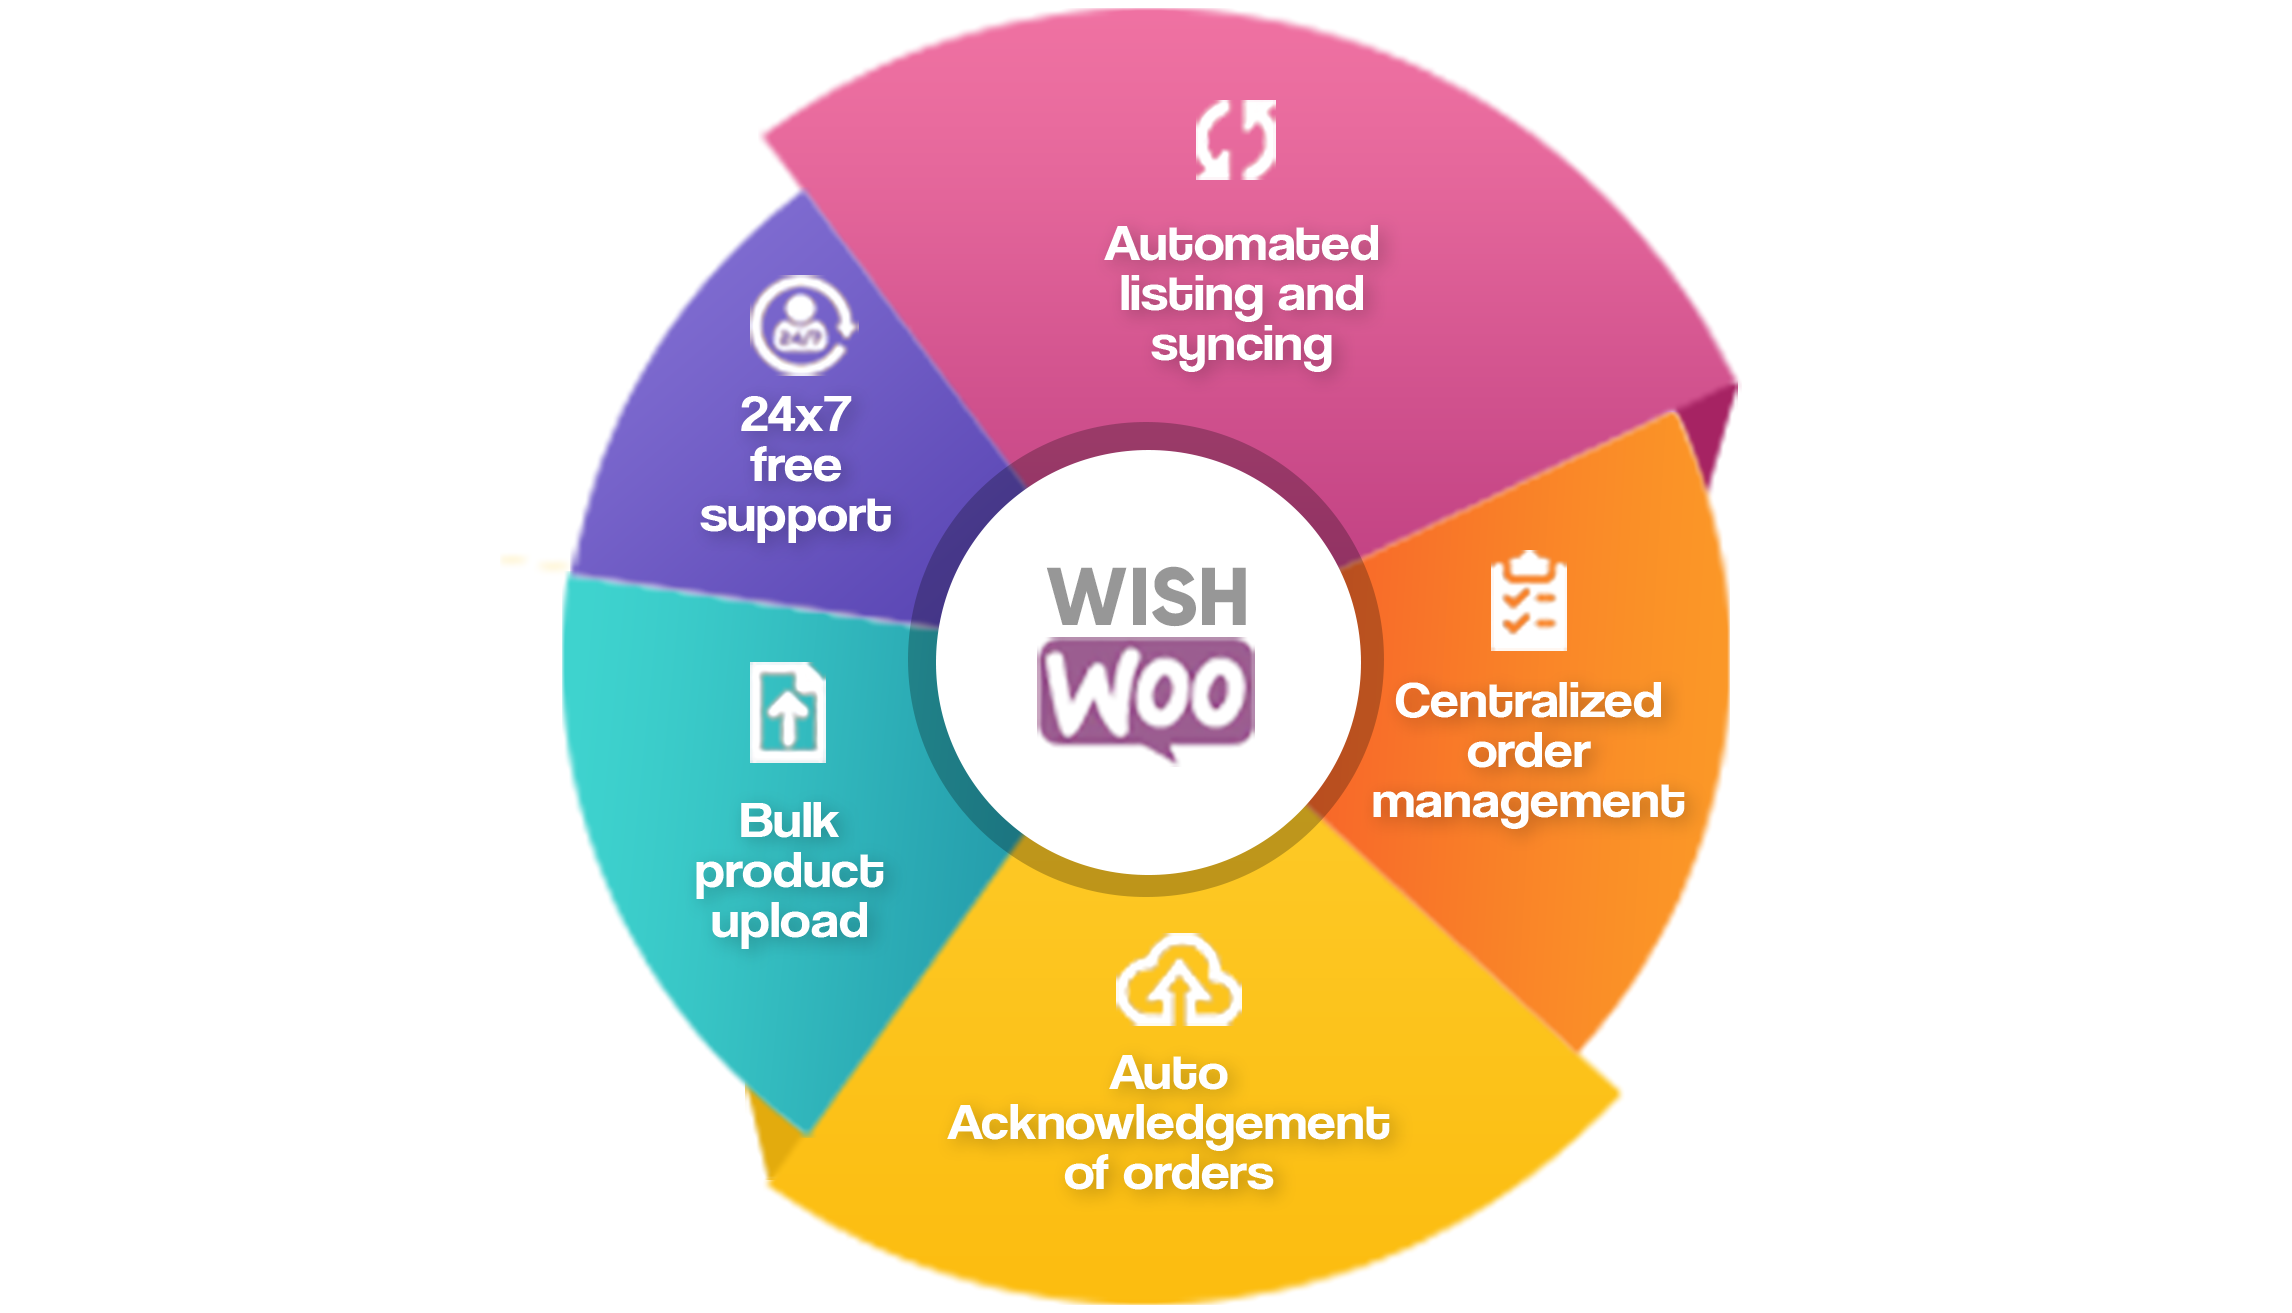 Wish Integration For WooCommerce